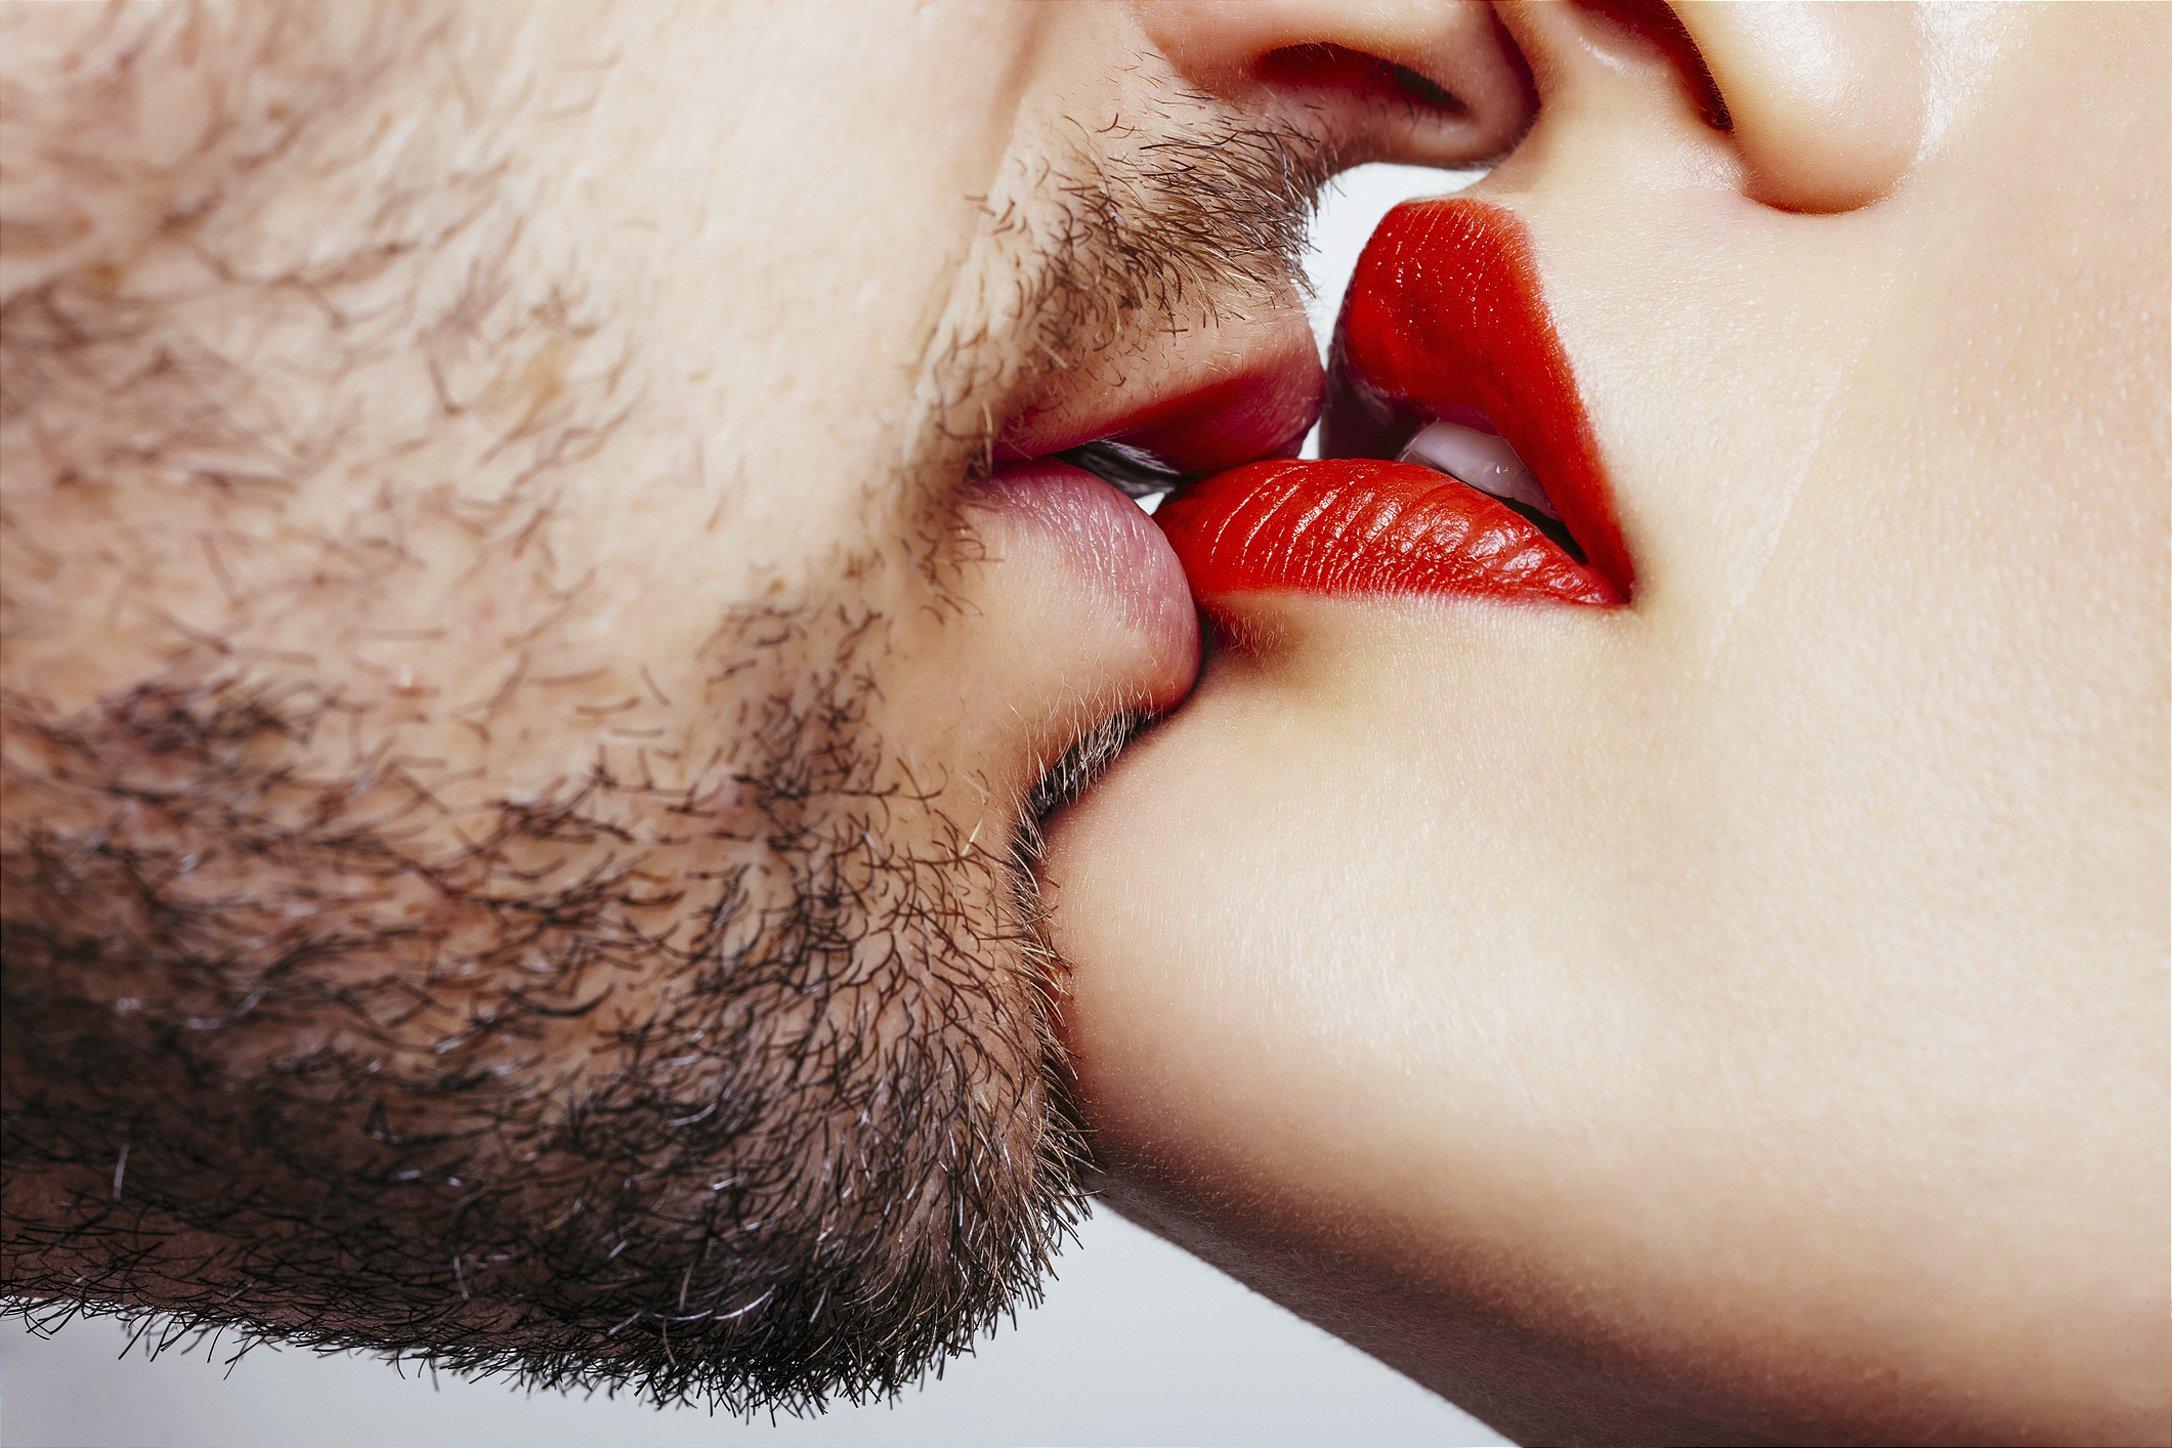 beijando mulher